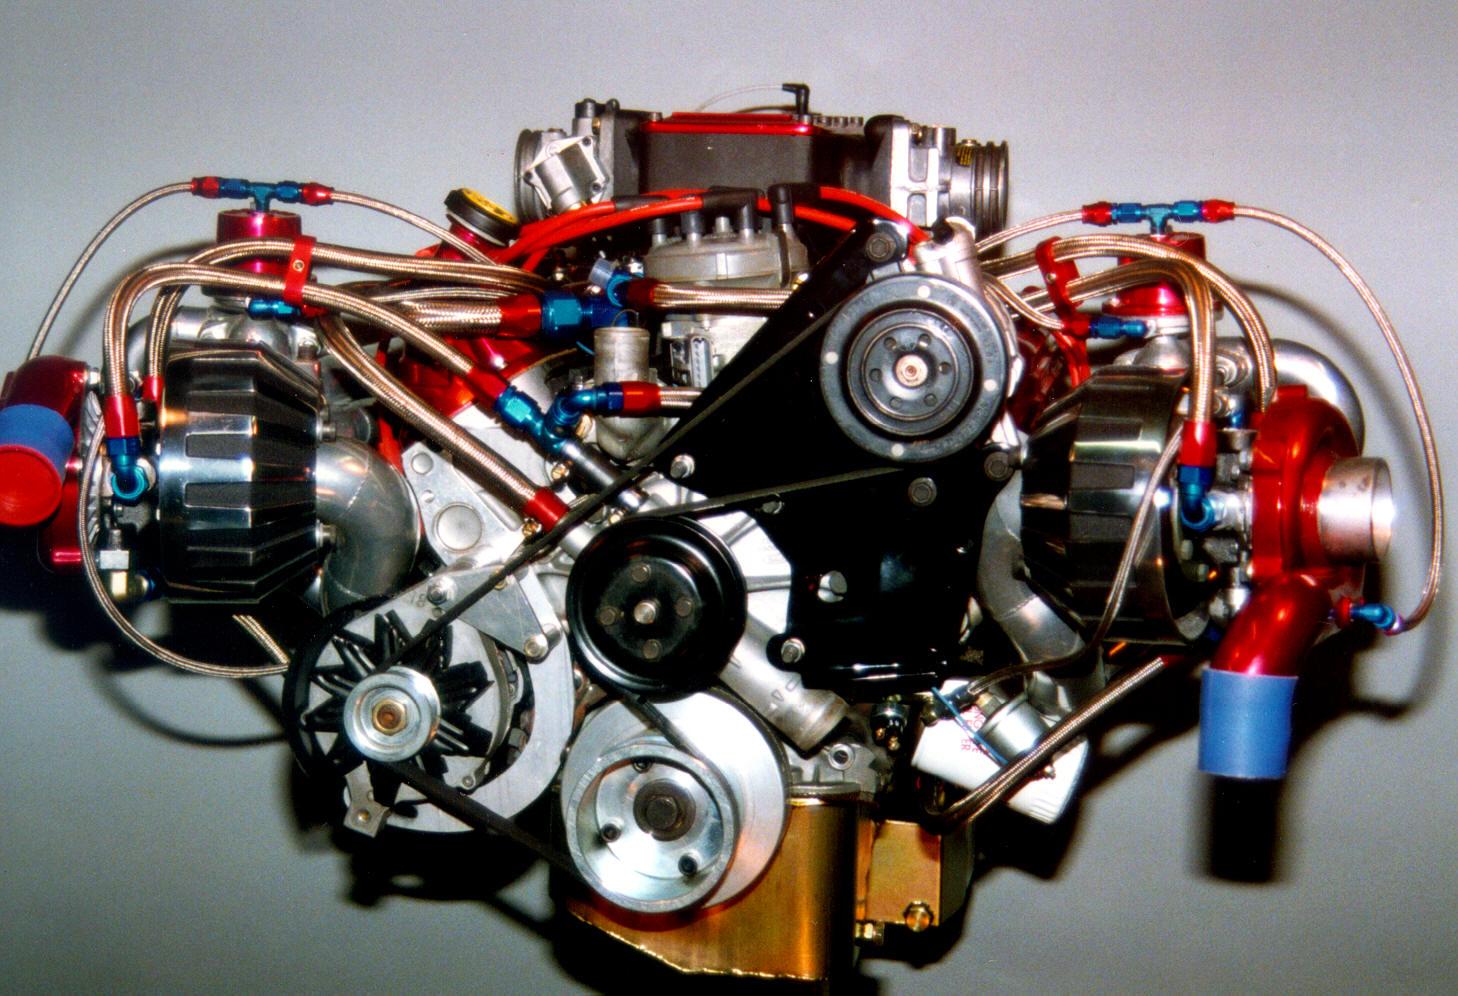 Best Car Engines Sushantskoltey 39 S Blog